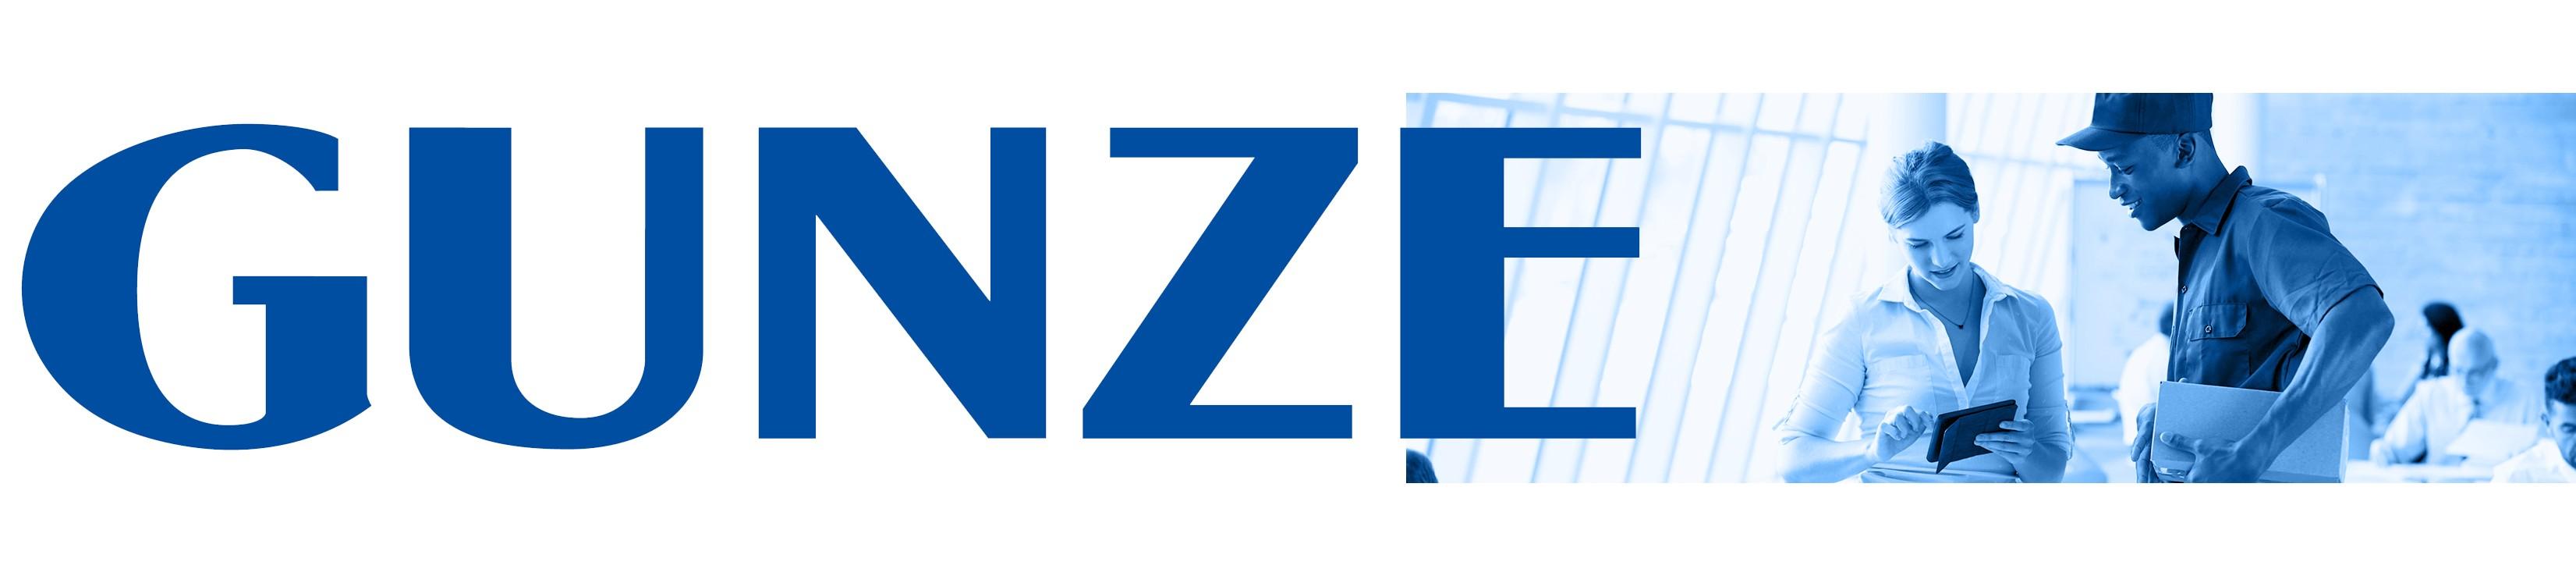 Gunze Electronics USA logo